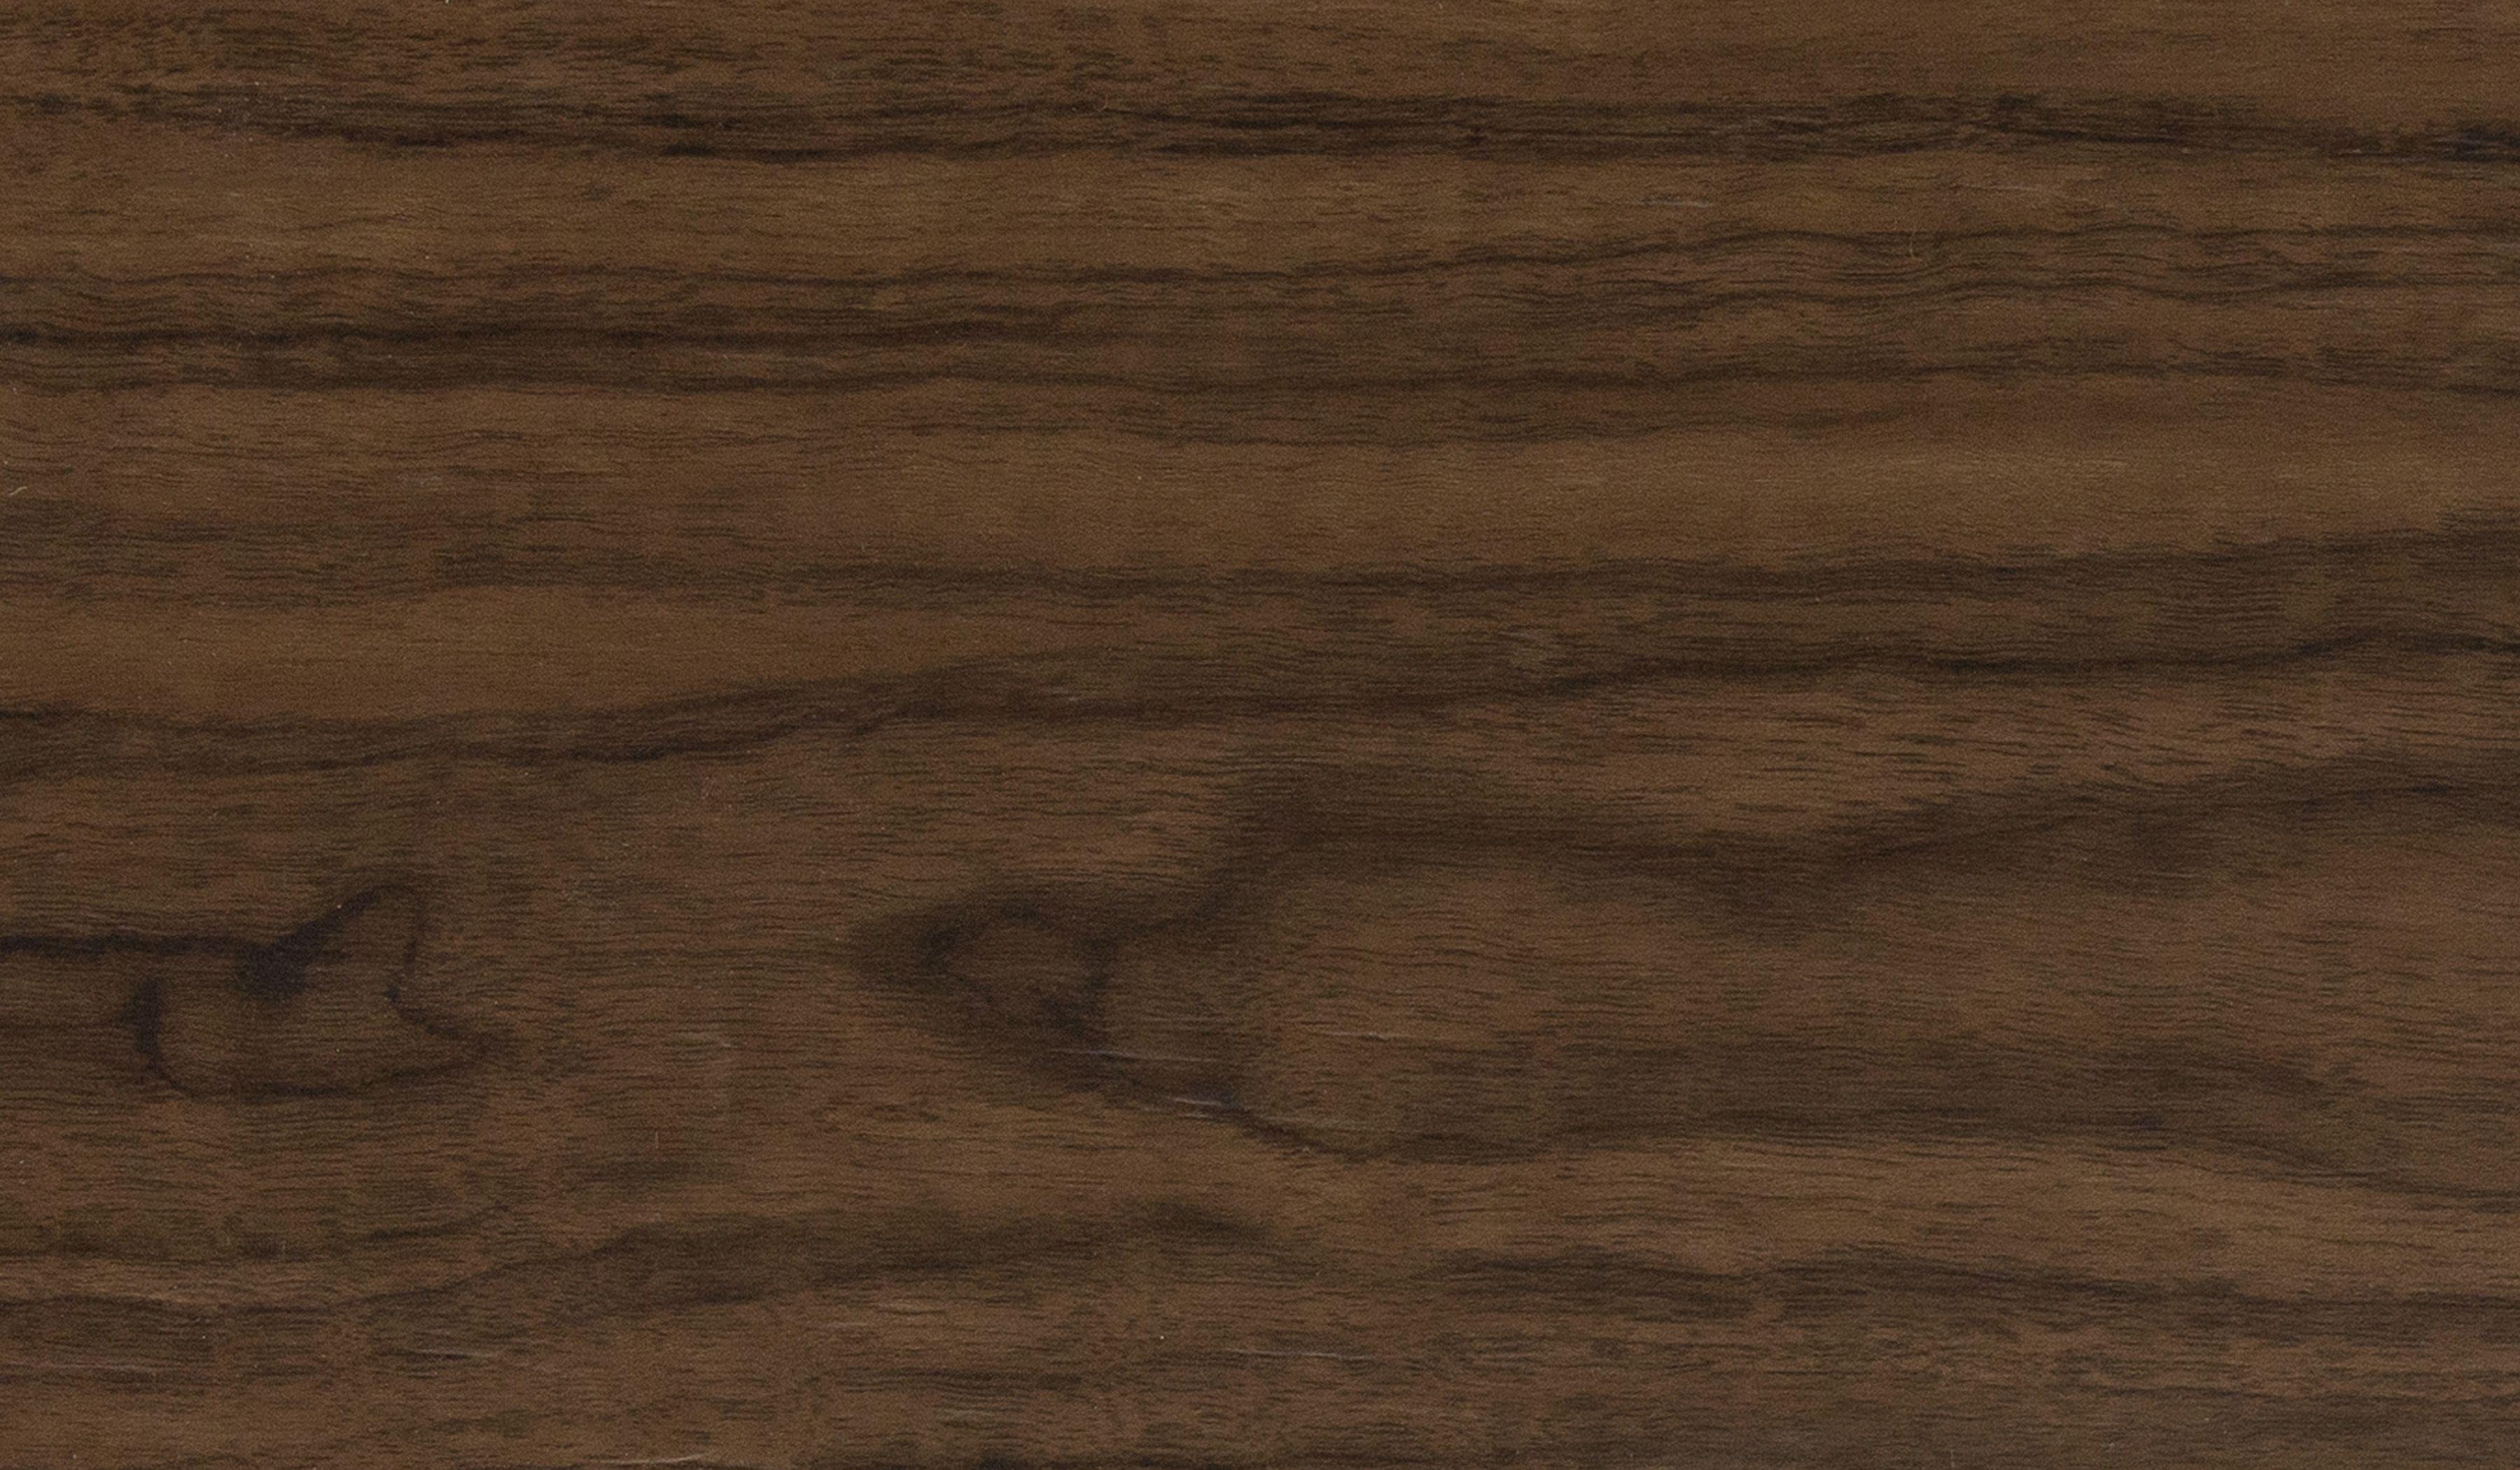 Shaw Quiet Cover 00790 Black Walnut Modular Carpet Tiles